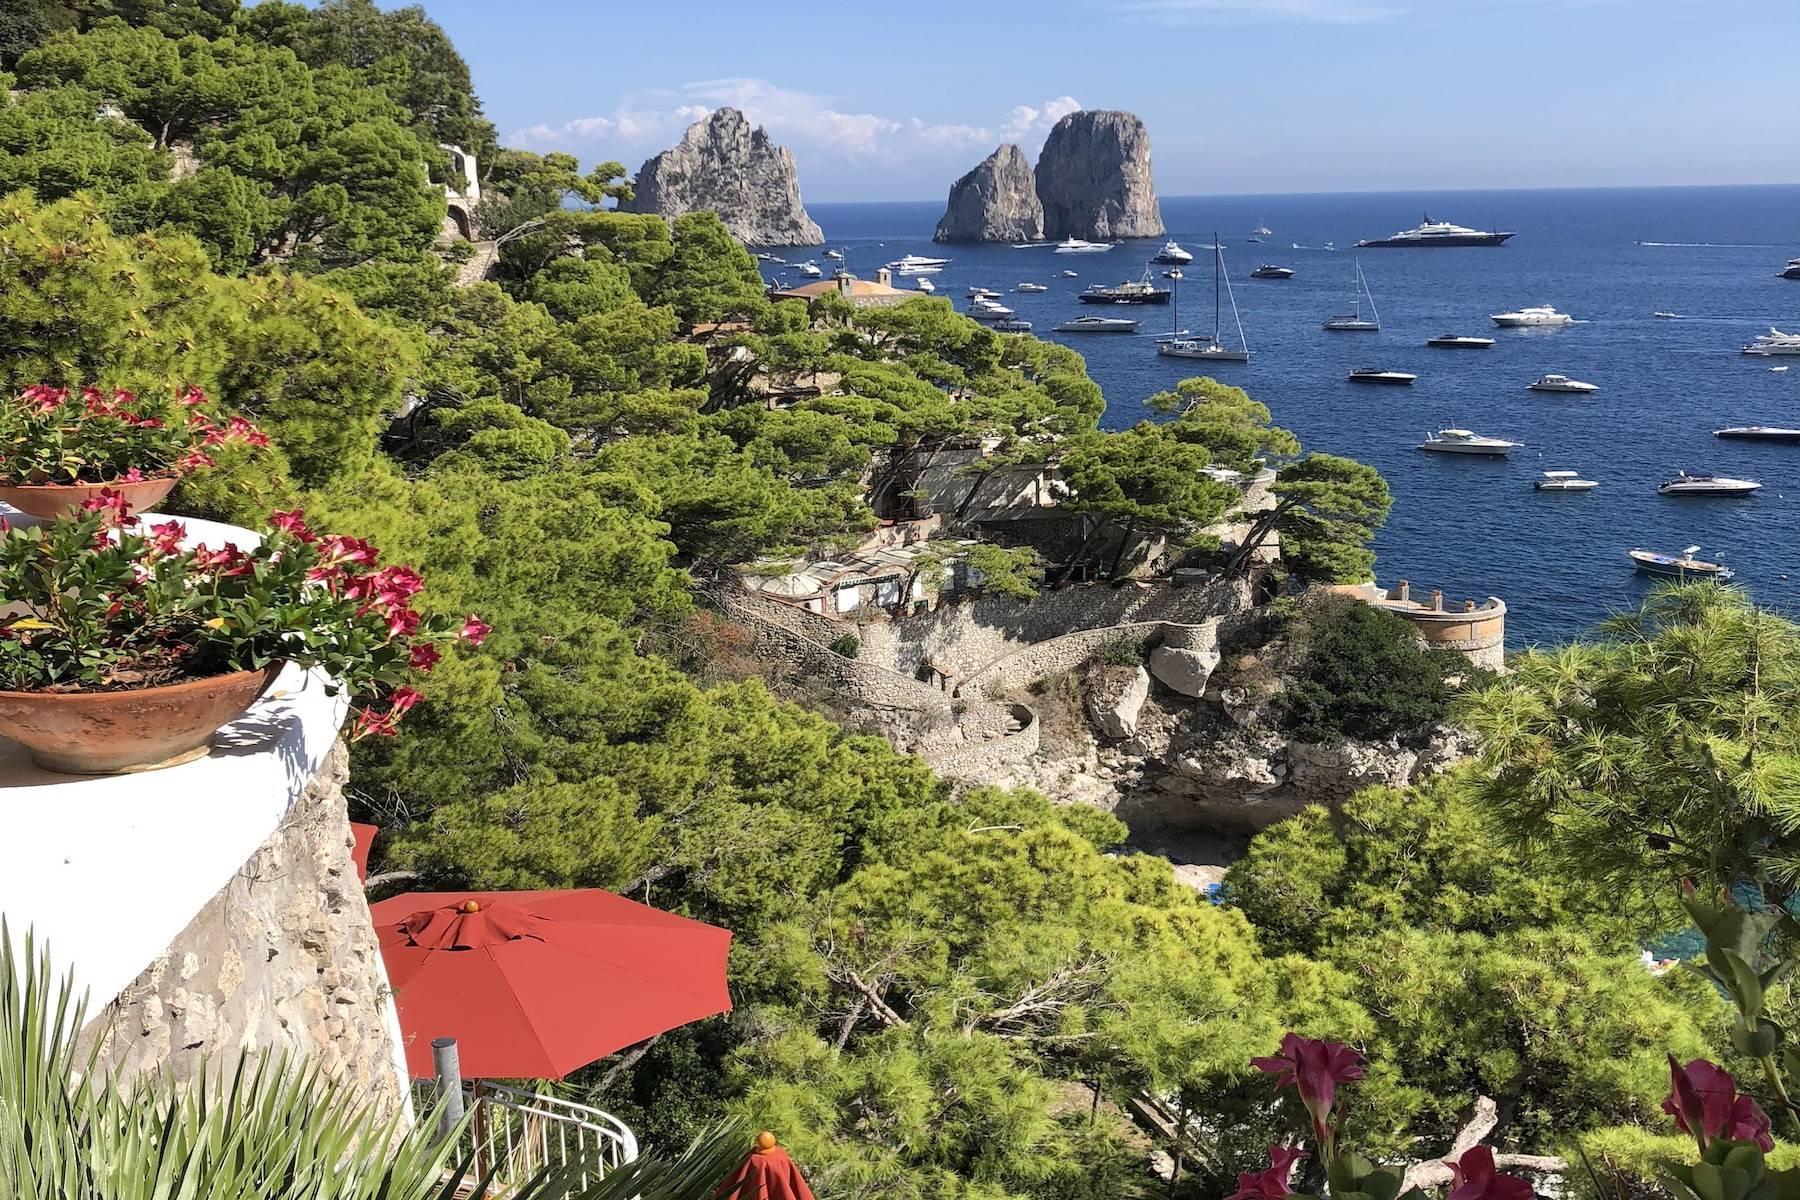 Villa Pieds dans l'eau in Capri - 1